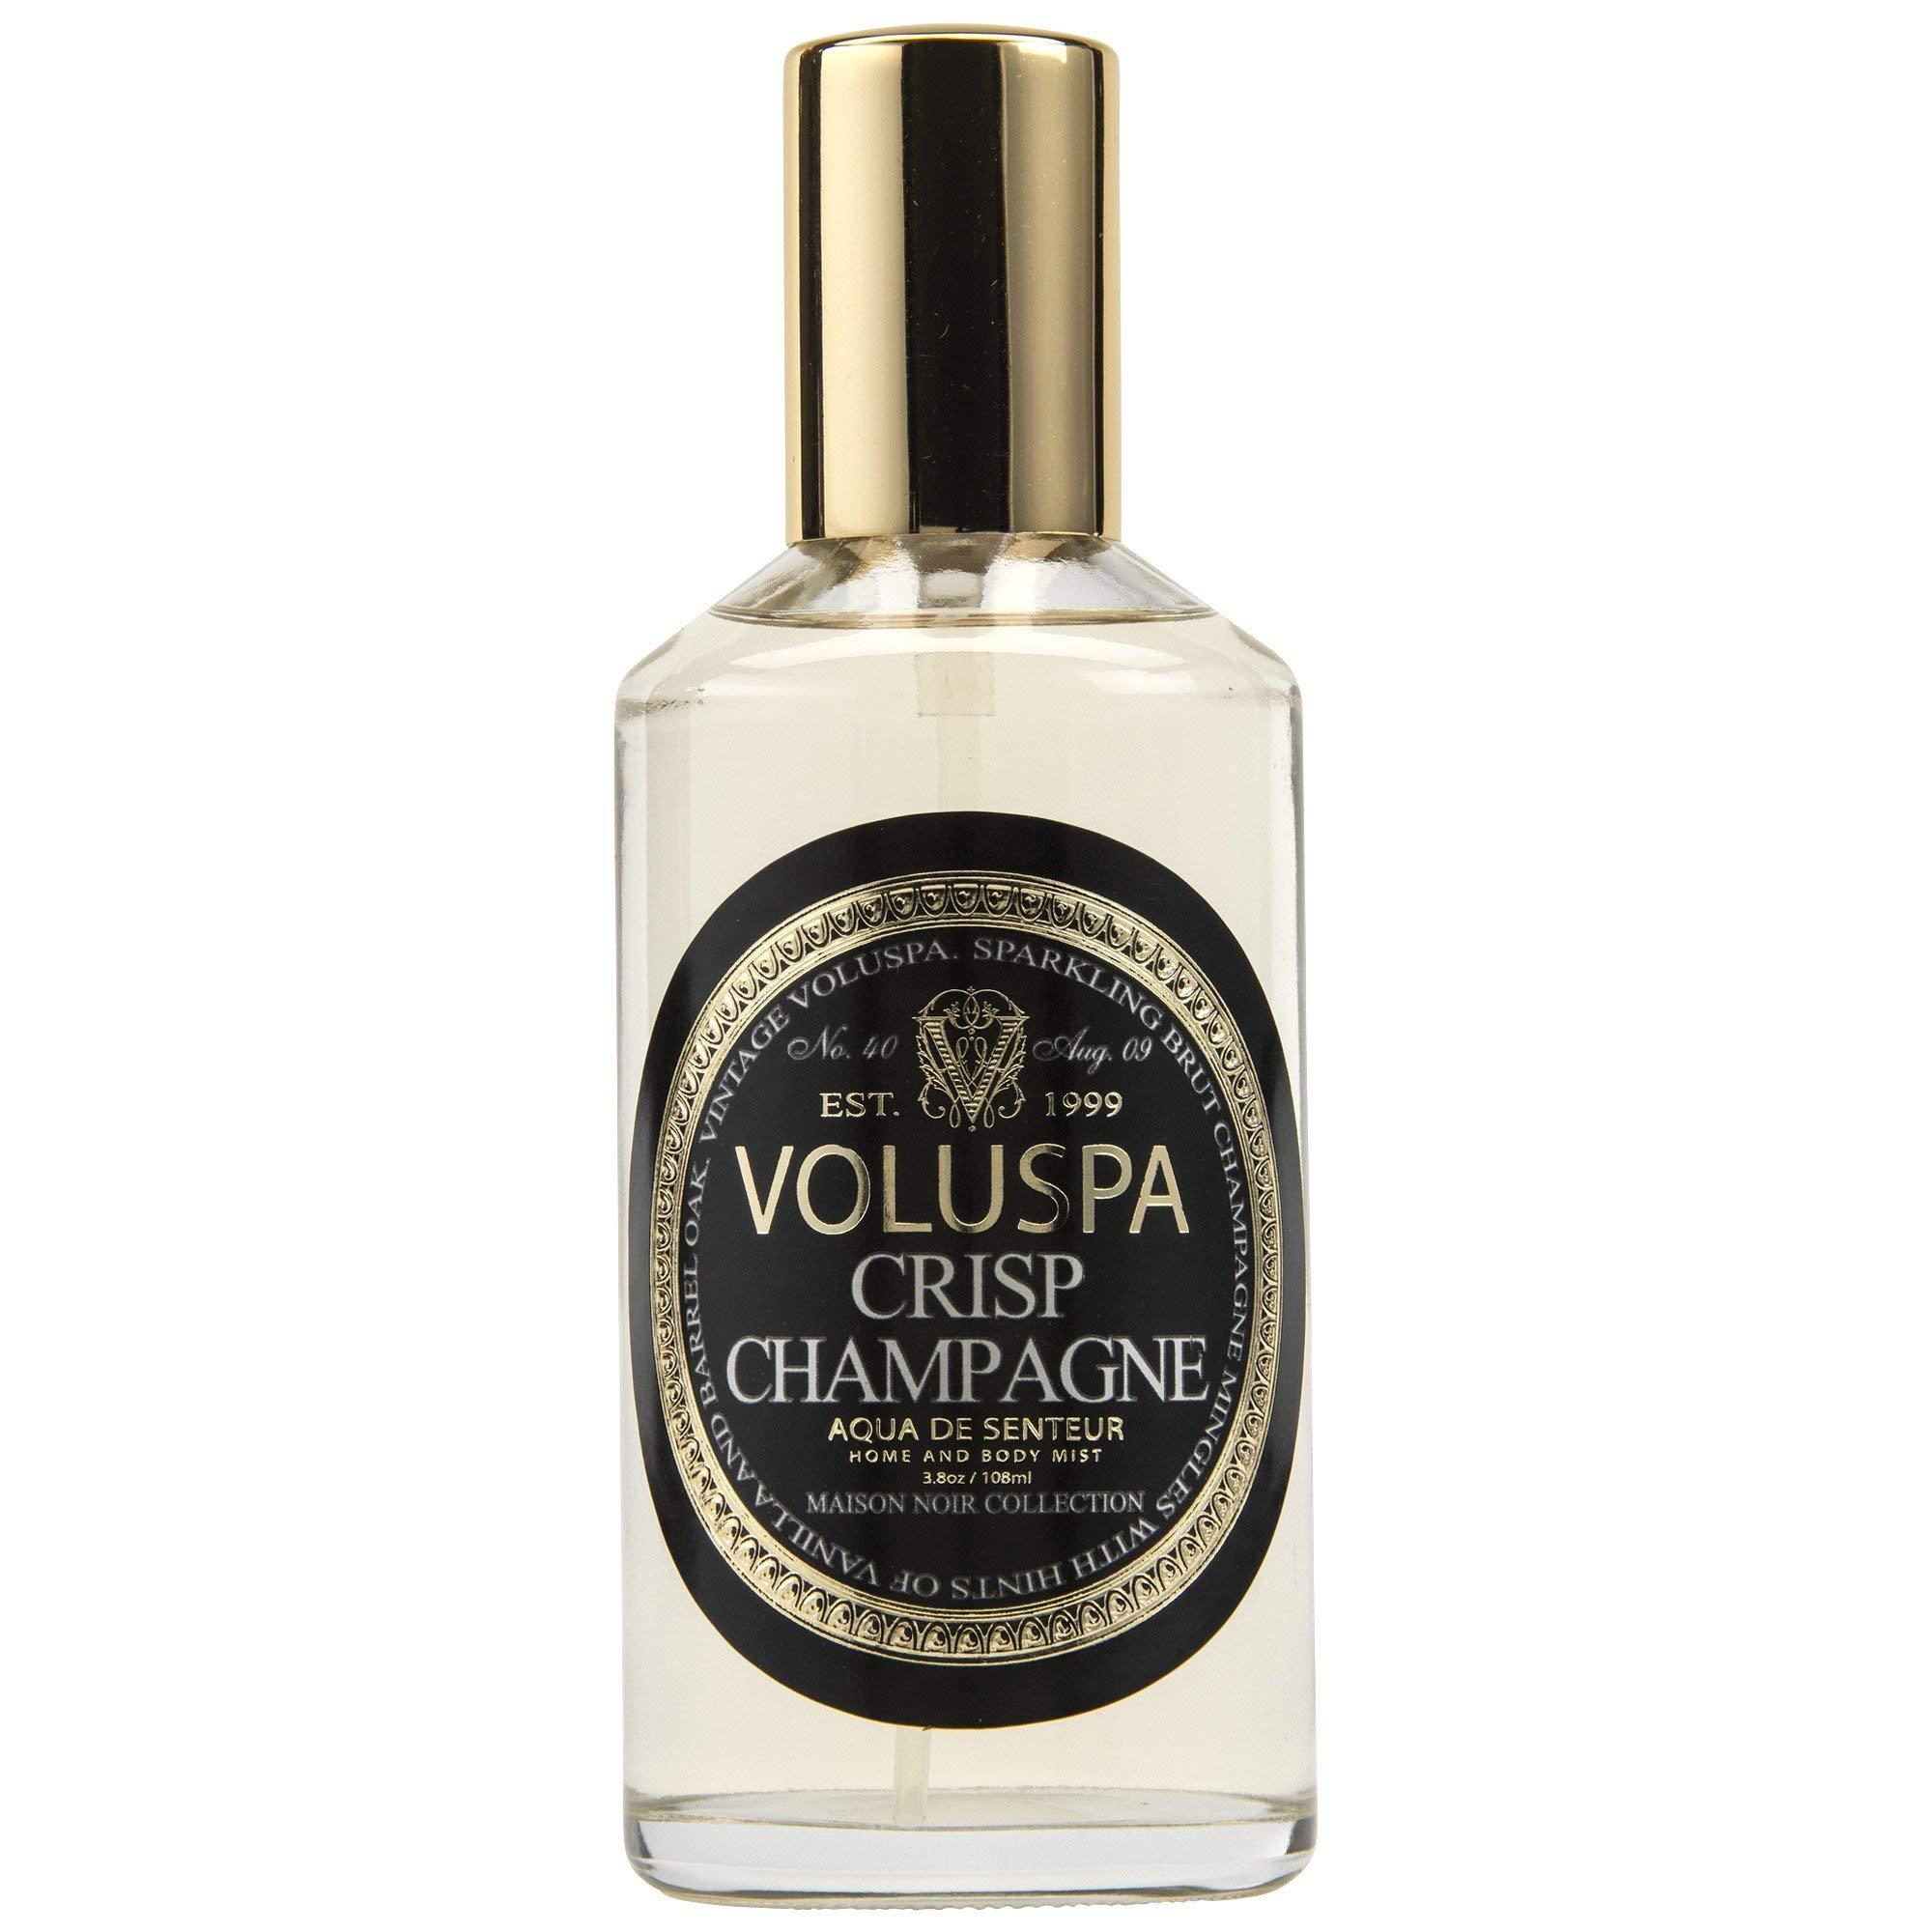 Voluspa Crisp Champagne Aqua De Senteur Room and Body Spray, 3.8 Ounce